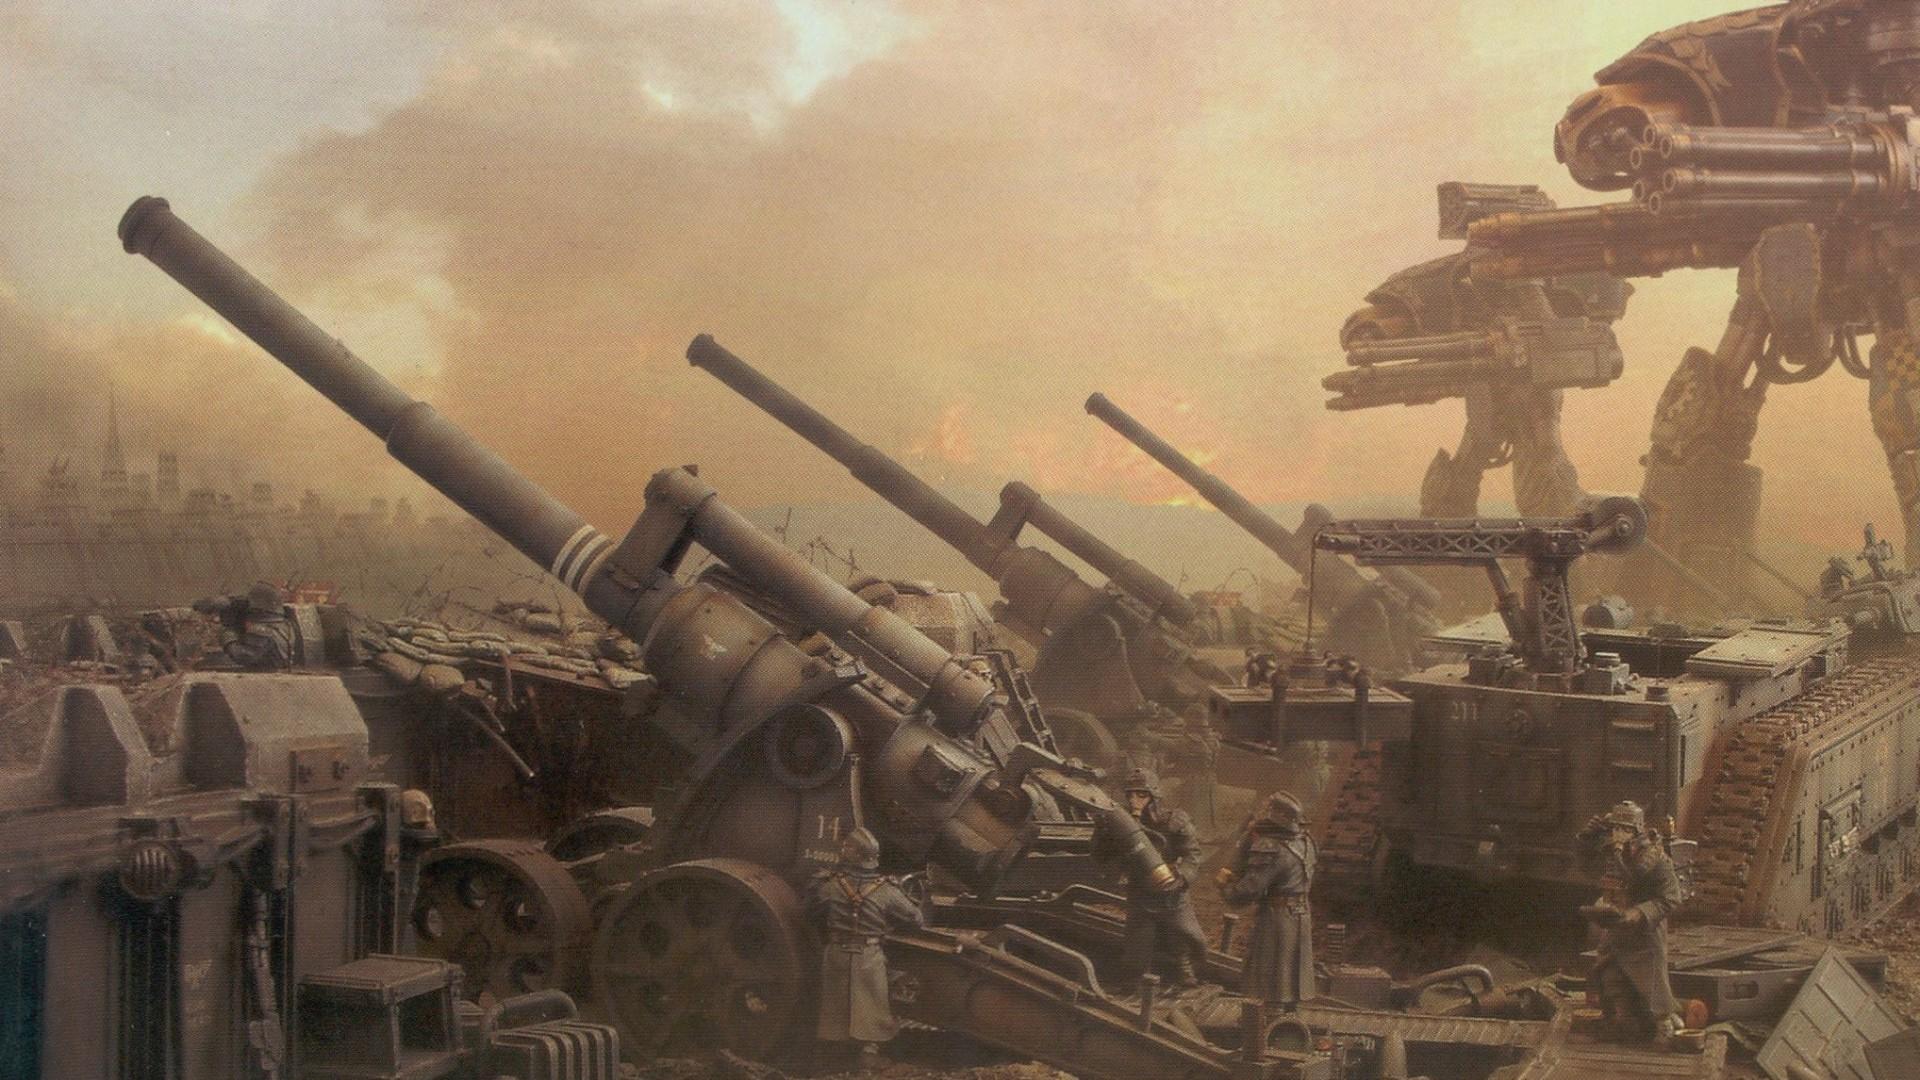 Warhammer 40K Res: HD / Size:589kb. Views: 18056